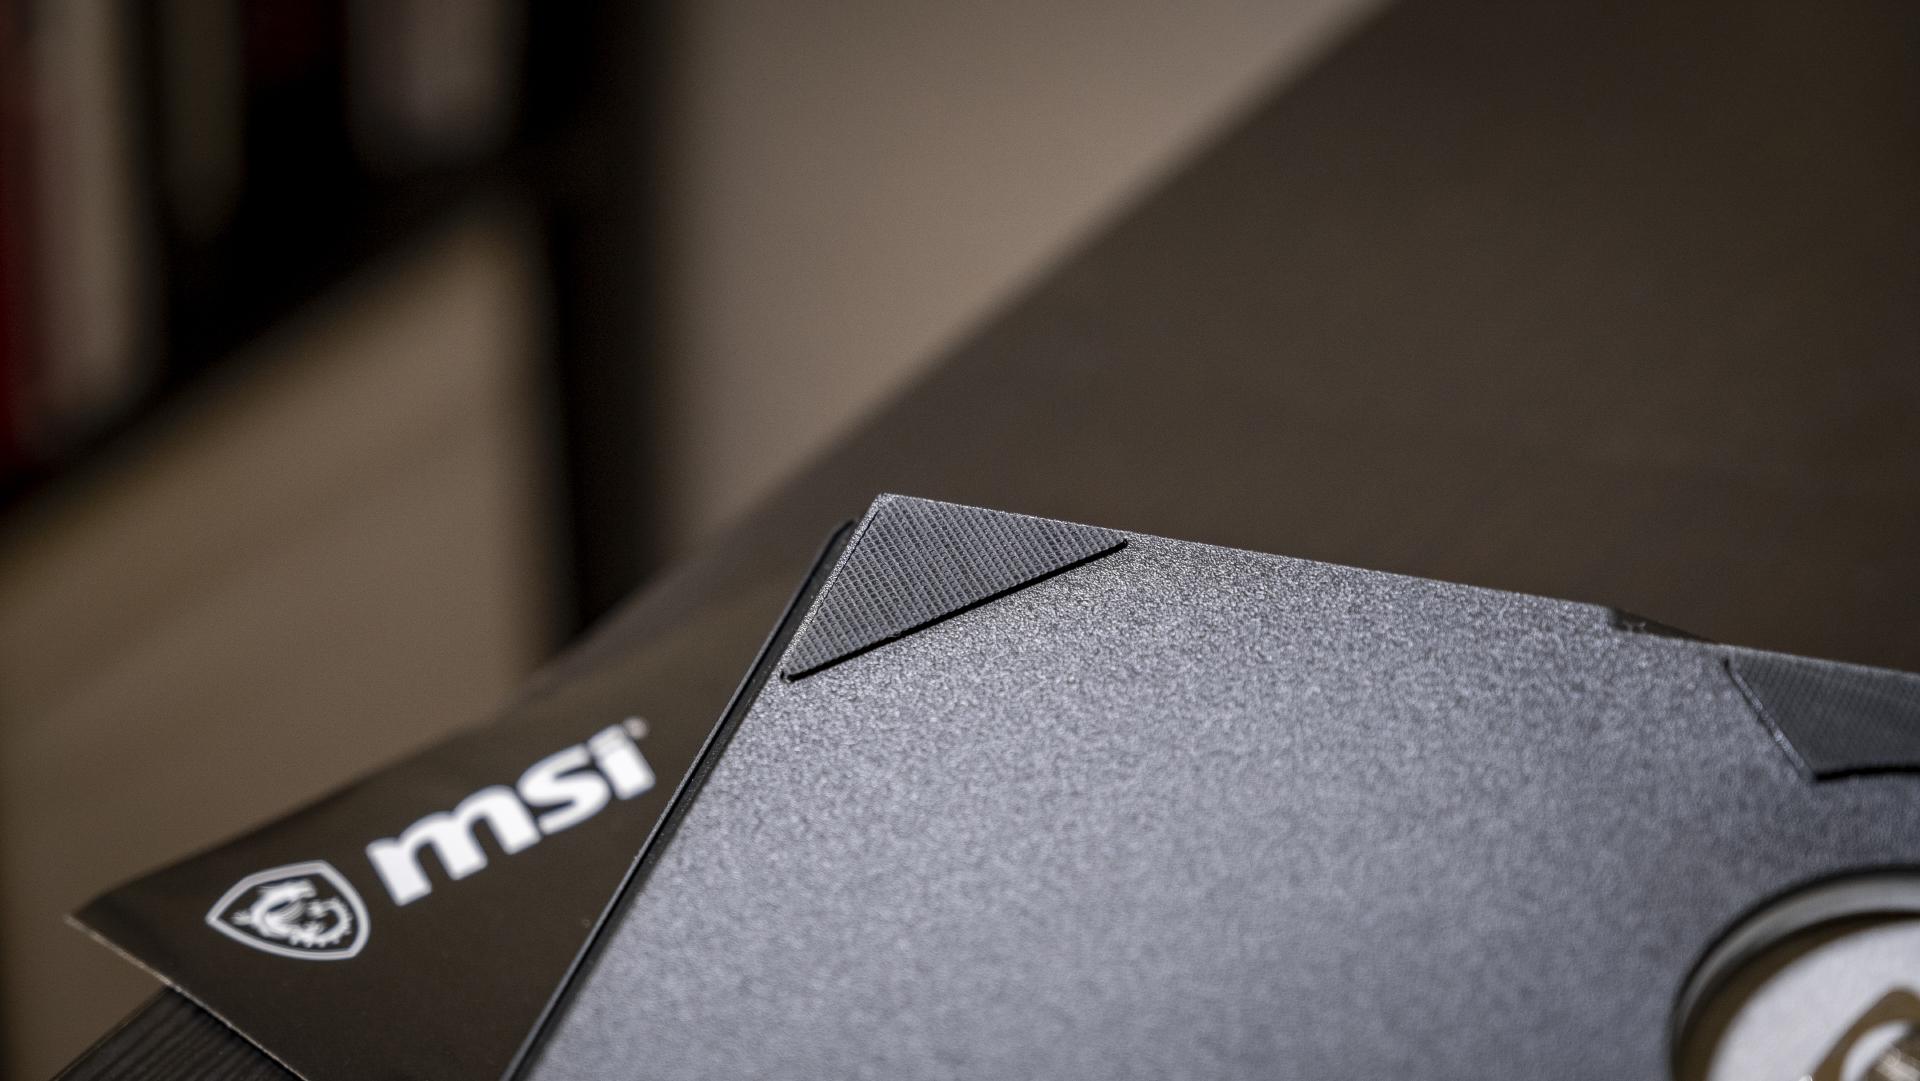 MSI Optix MAG274QRF-QD Standfuß Gumminoppen Close-Up